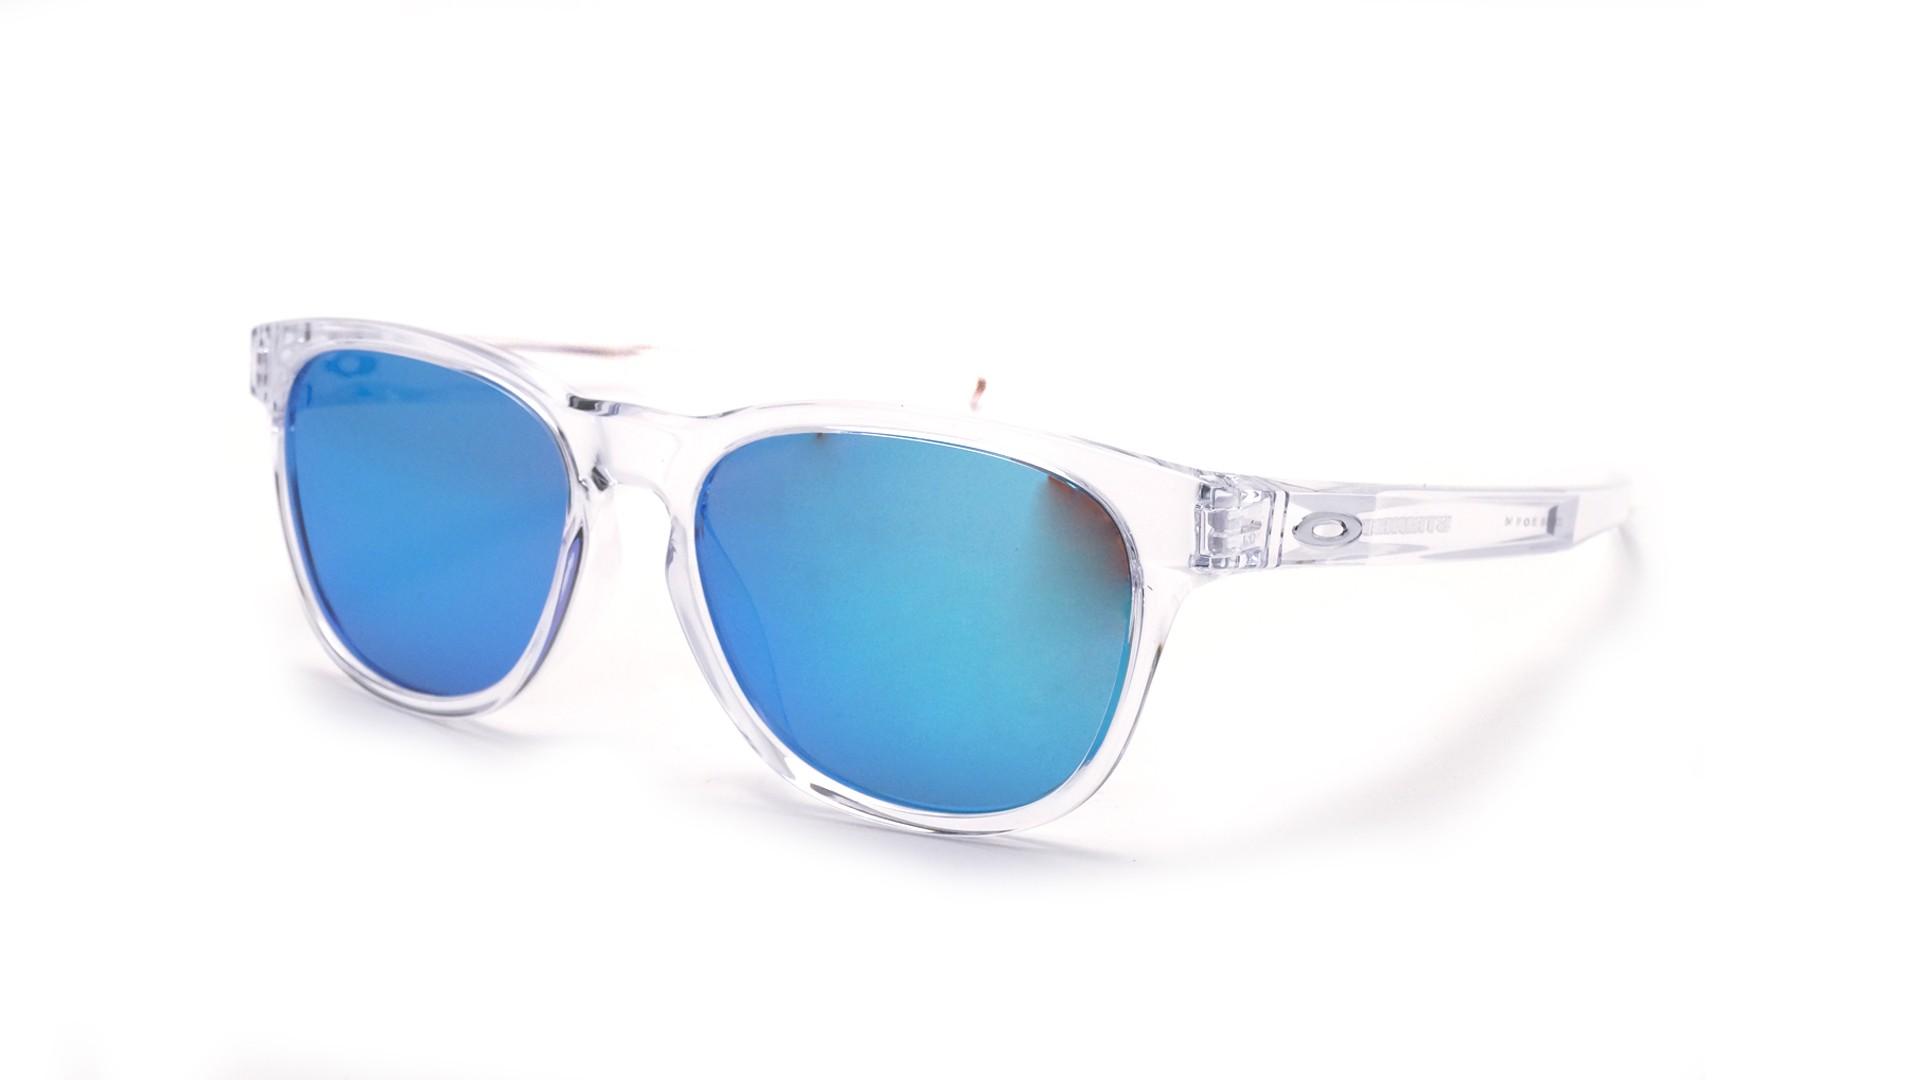 Lunettes de soleil Oakley Stringer Polished clear Transparente OO9315 06  55-16 Medium Miroirs 9fbd5eb39876